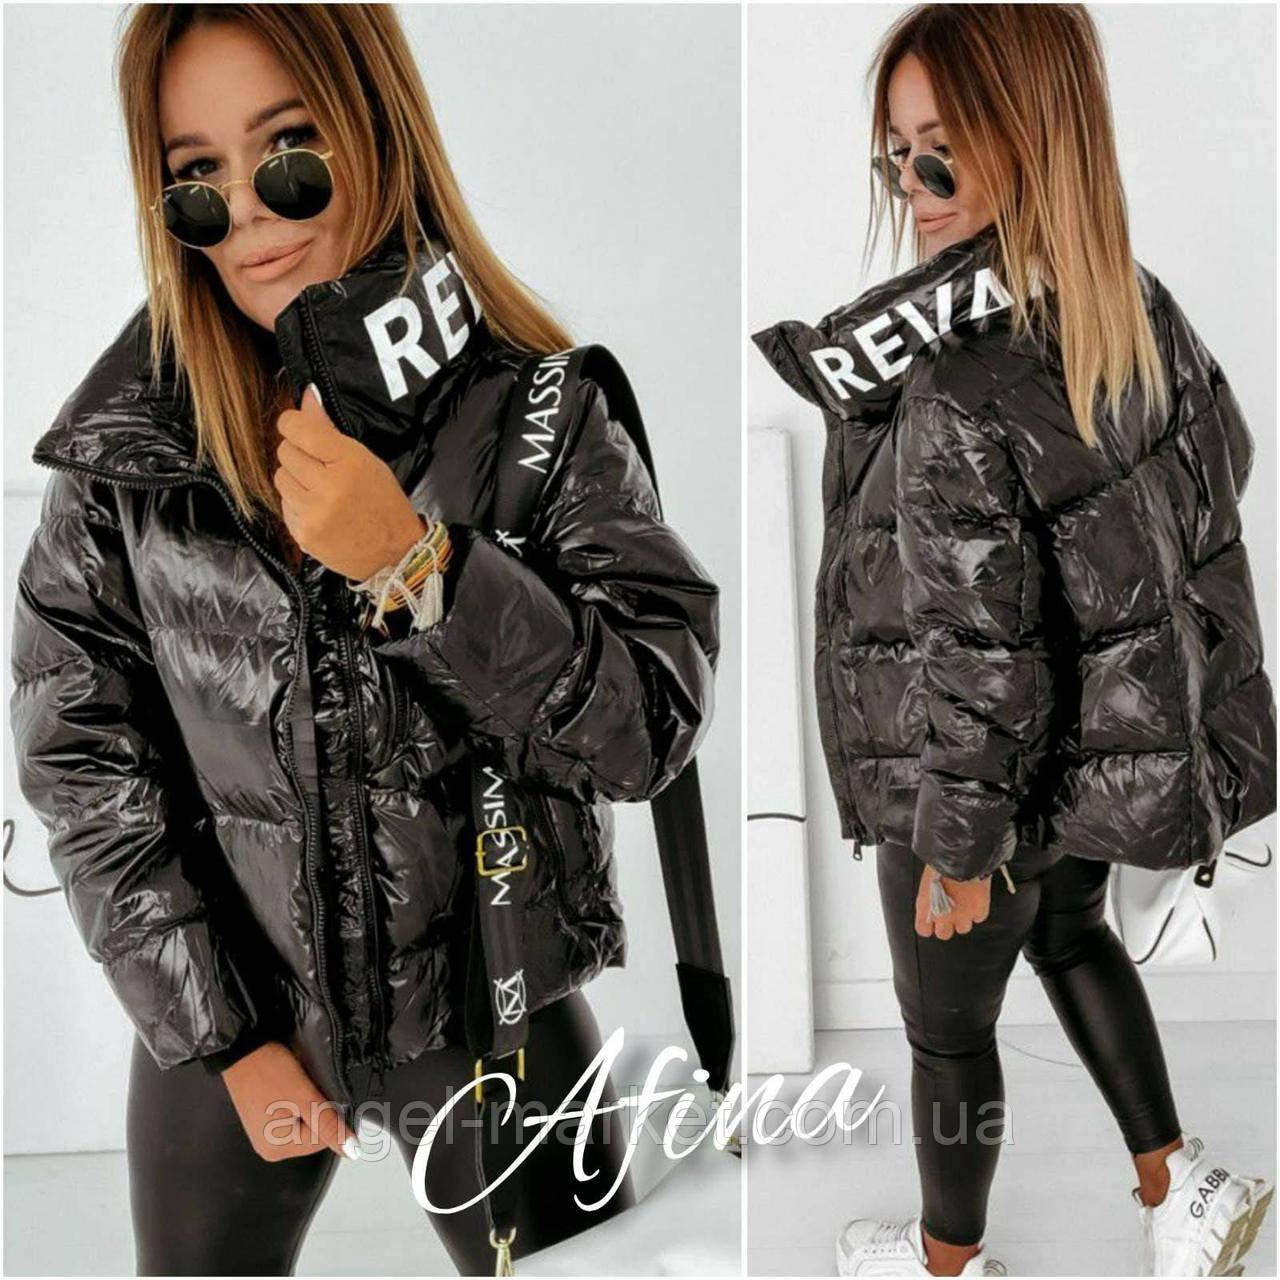 Зимняя  женская  куртка синтепон 200 норма и батал новинка 2020